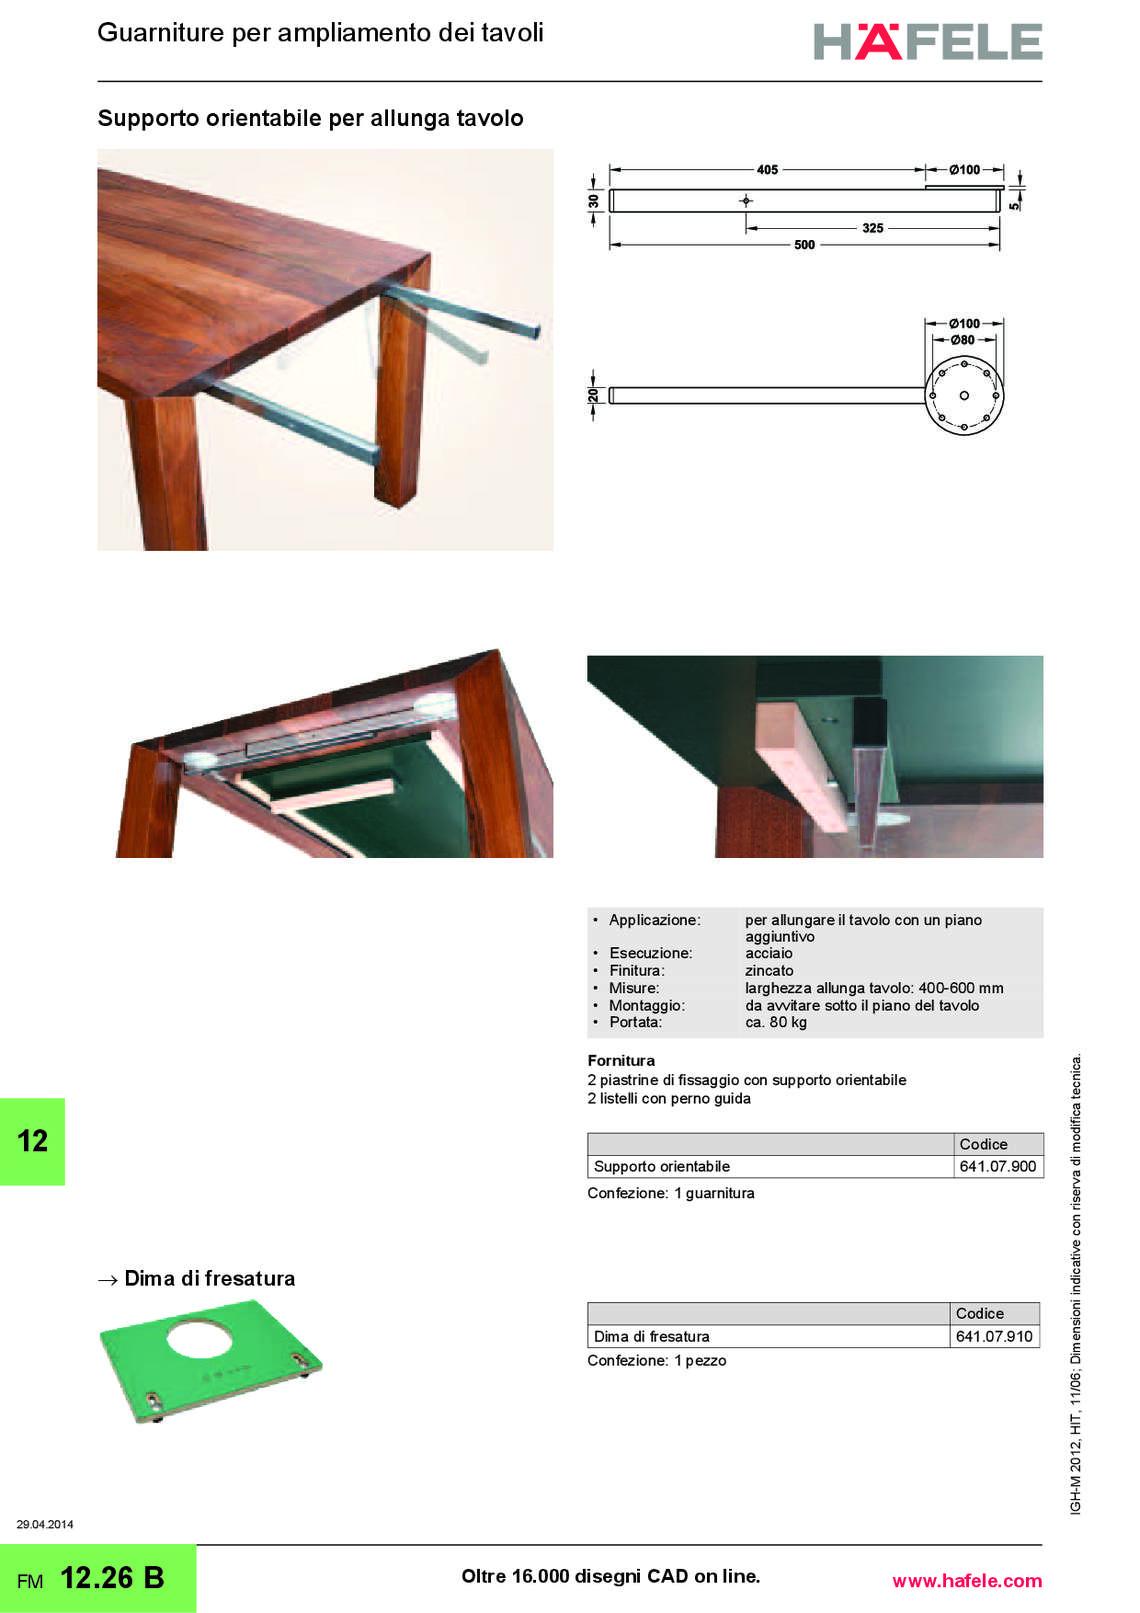 hafele-sottostrutture-per-mobili_83_047.jpg